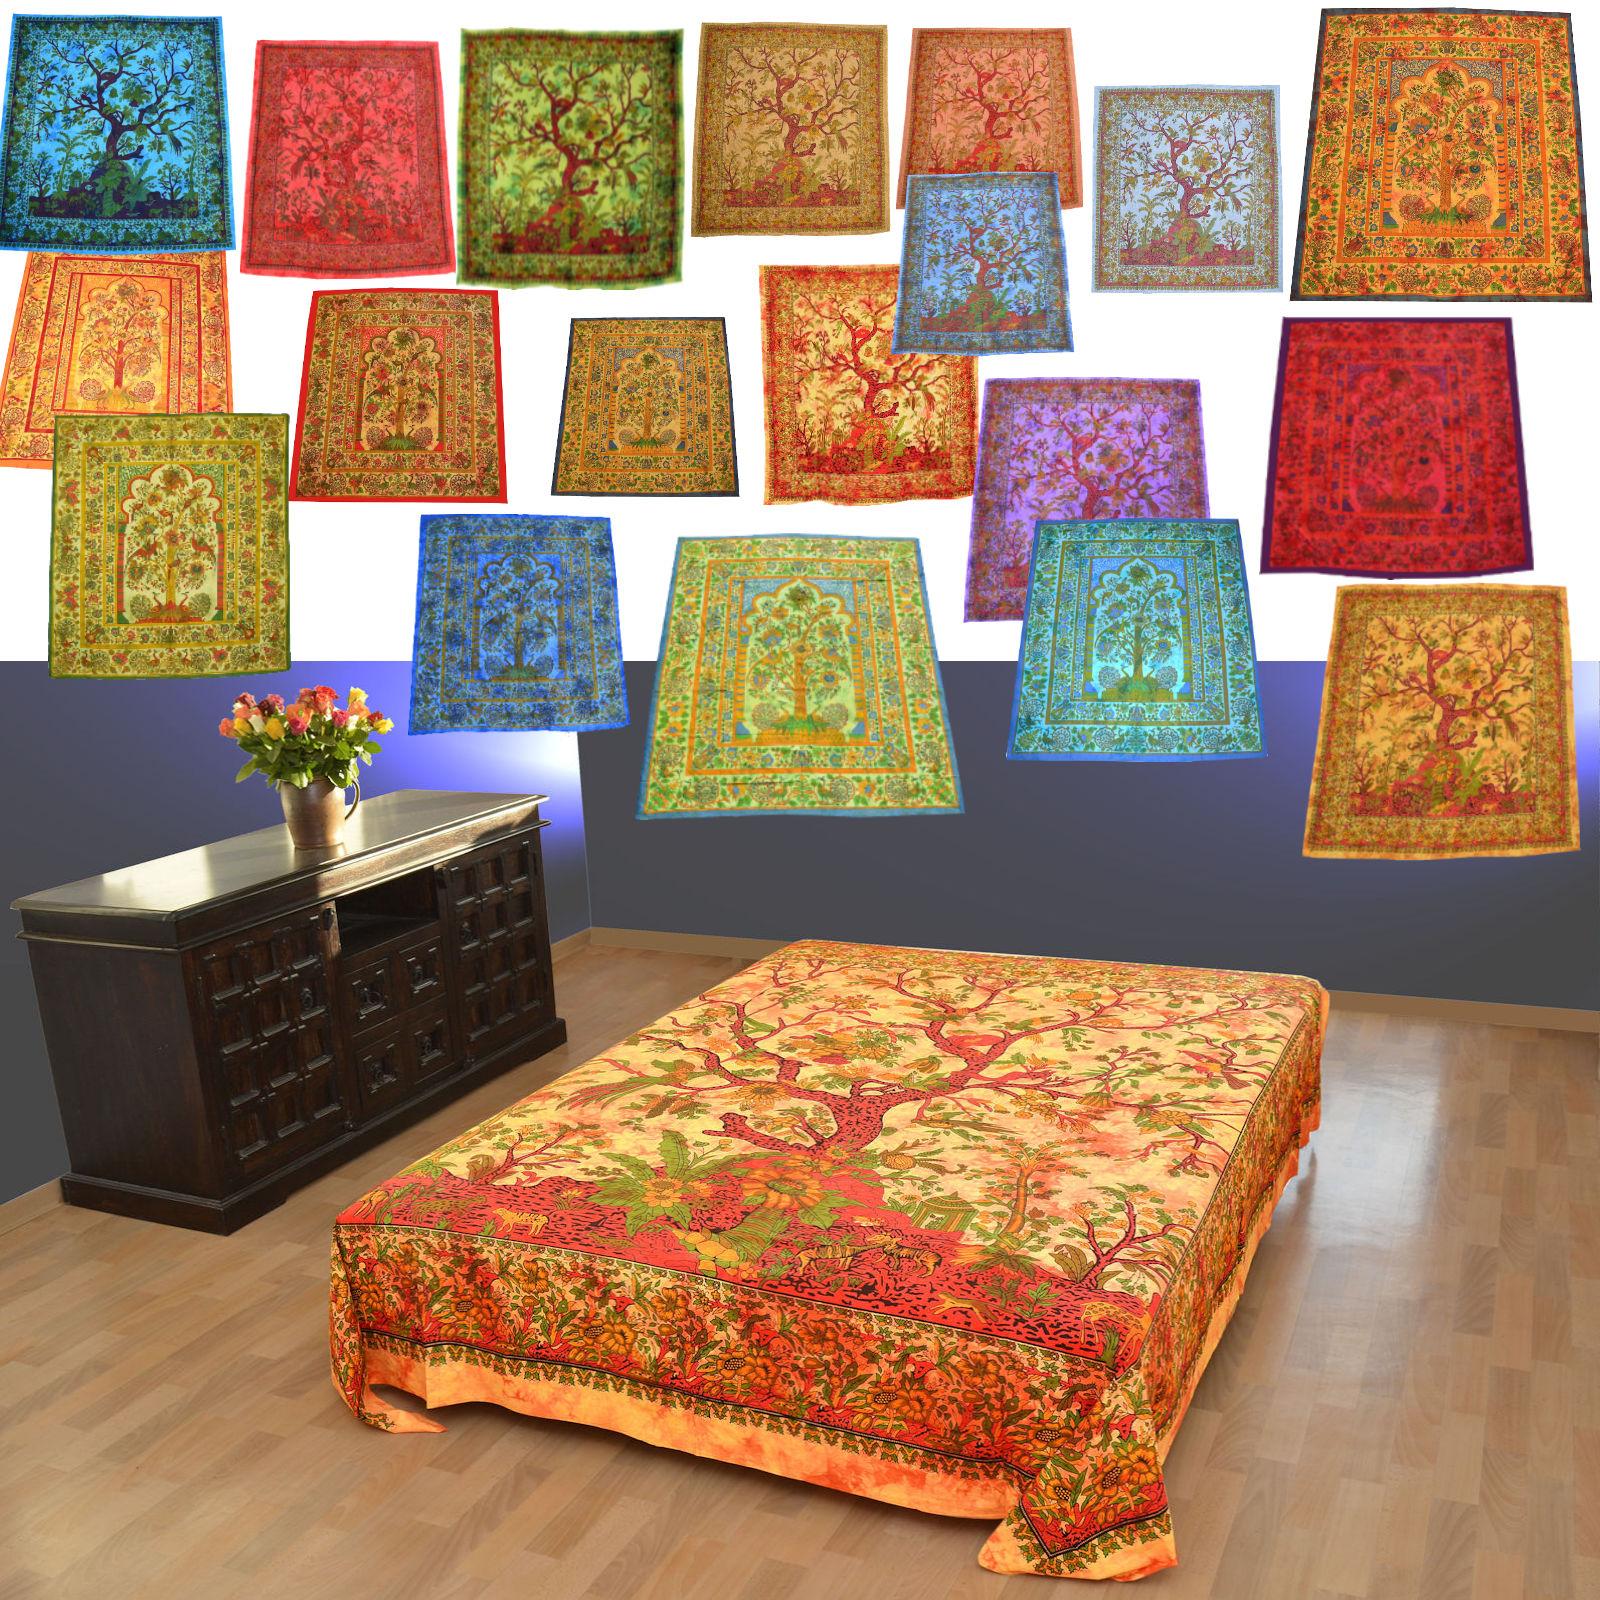 tagesdecke xxl sofa berwurf bett berwurf wohndecke nepal morocco baumwolle decke ebay. Black Bedroom Furniture Sets. Home Design Ideas